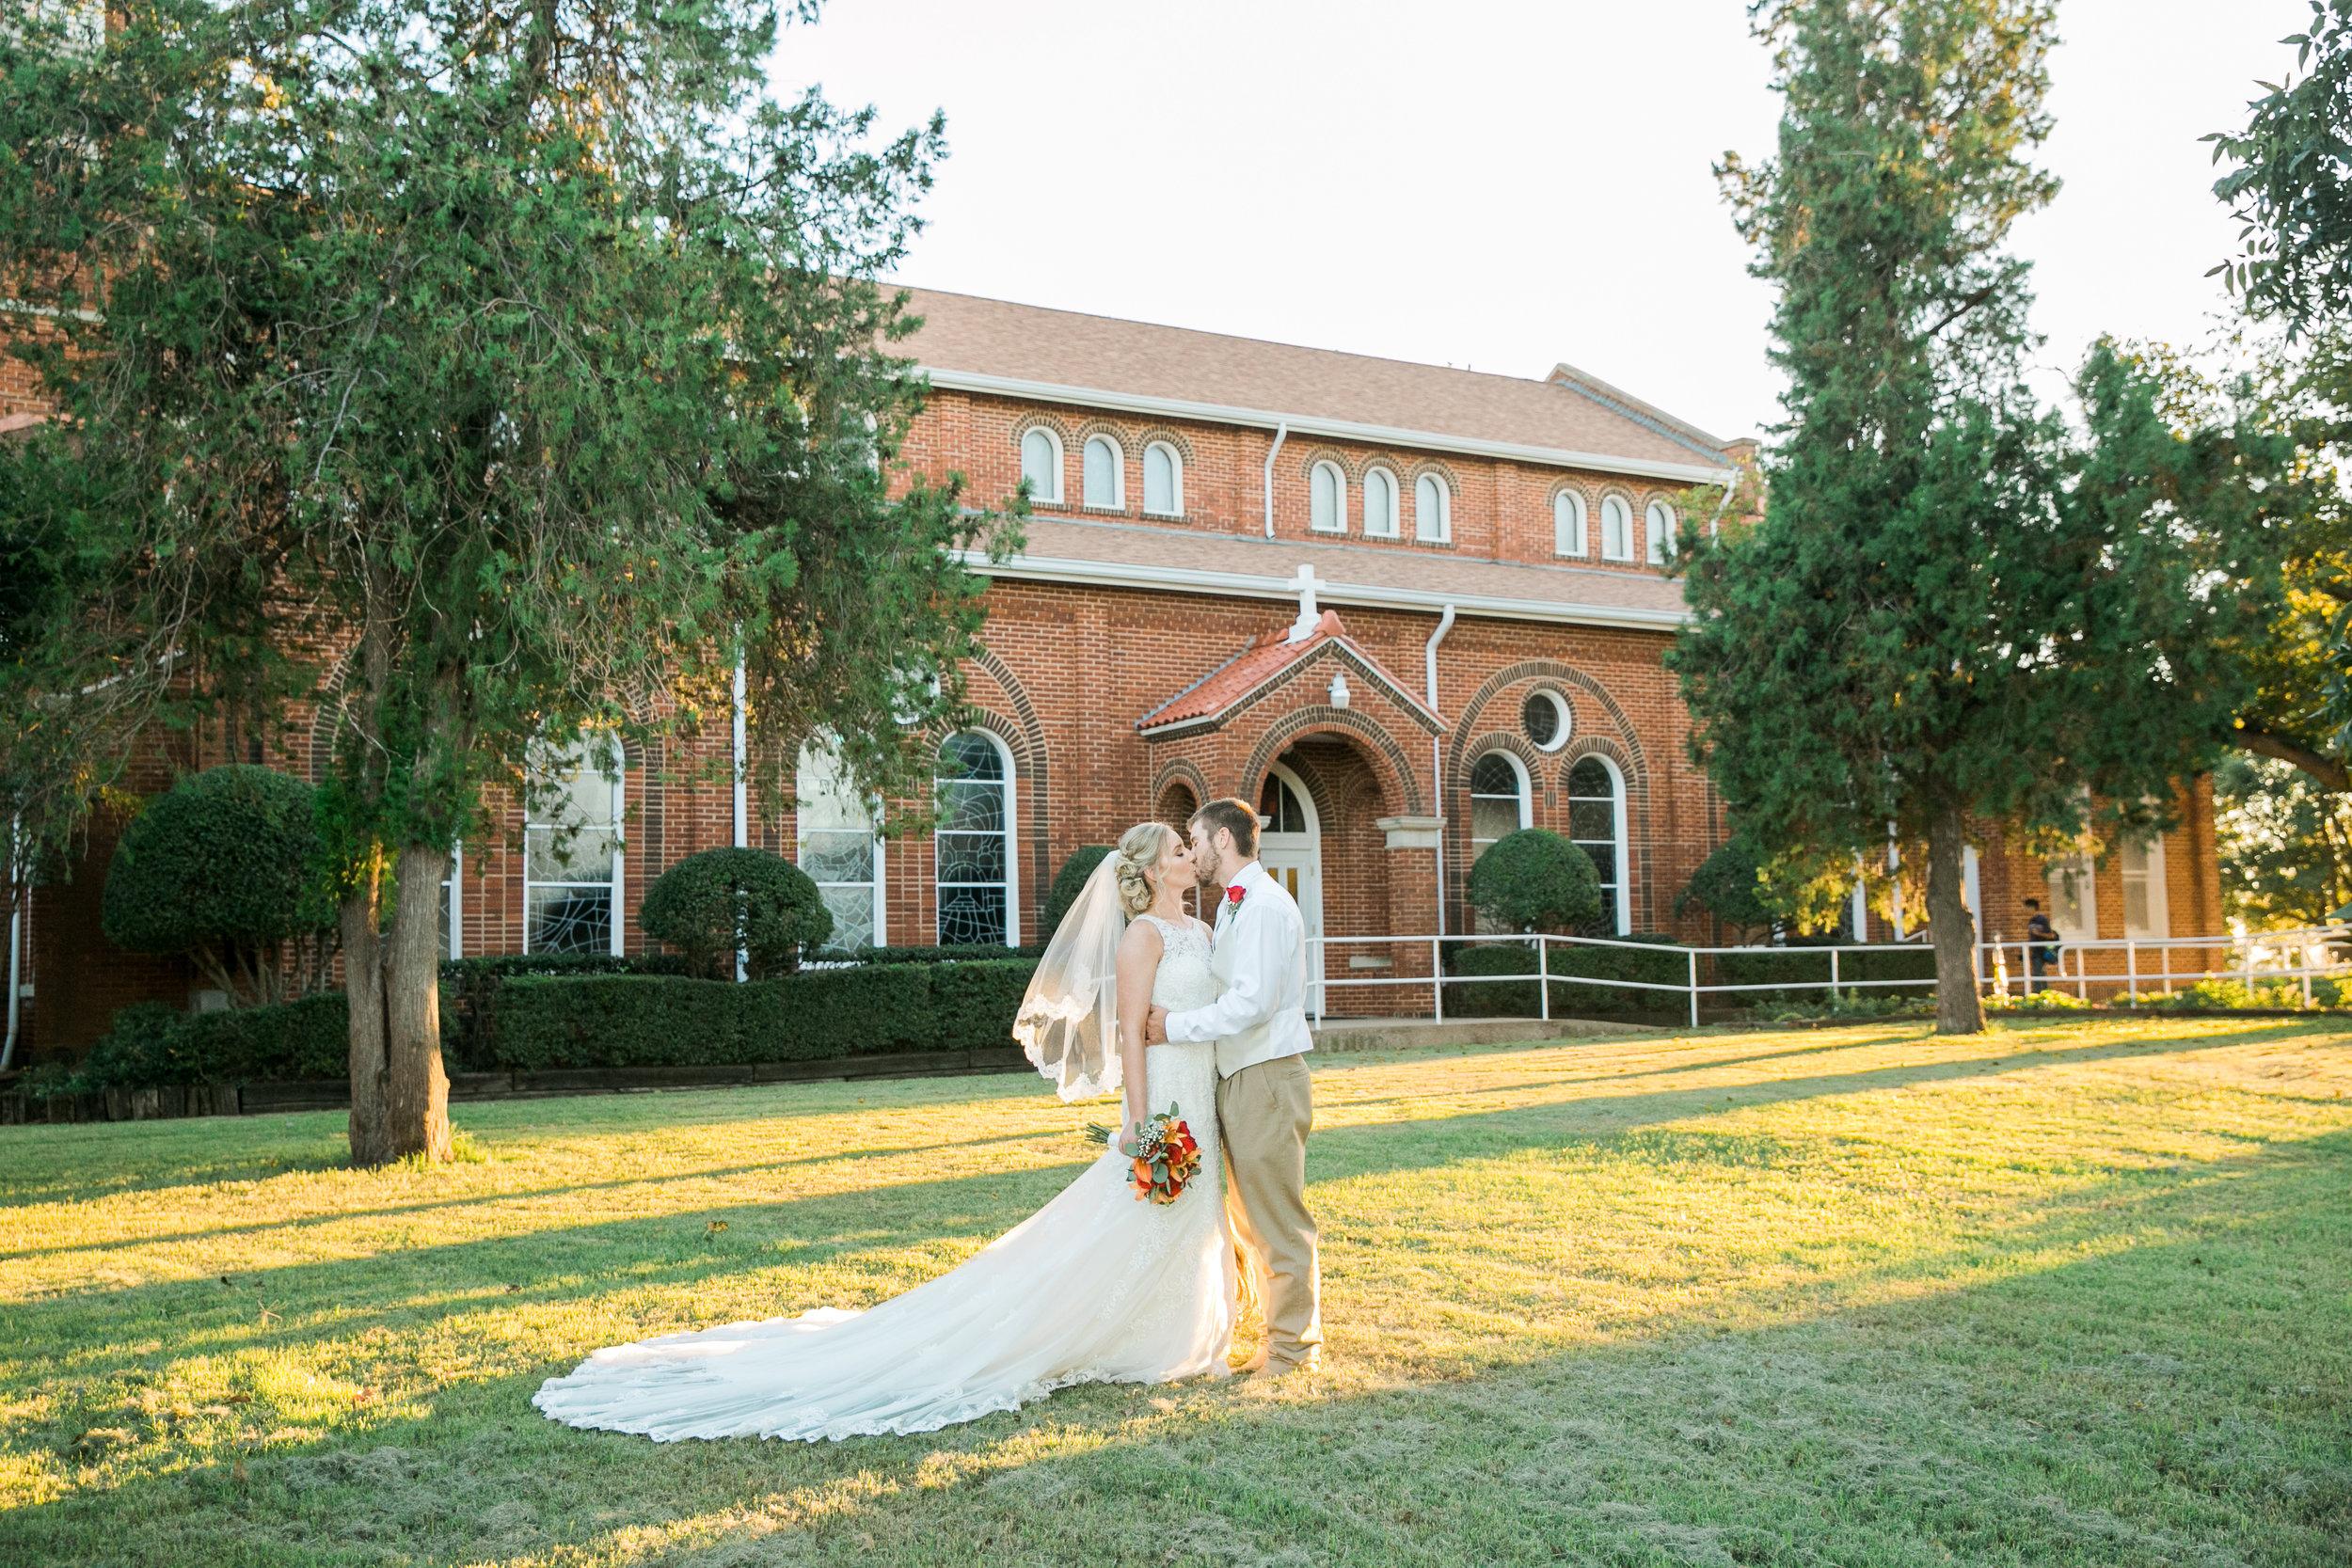 Bailey-Nathan-Windthorst-Texas-Wedding-048.jpg